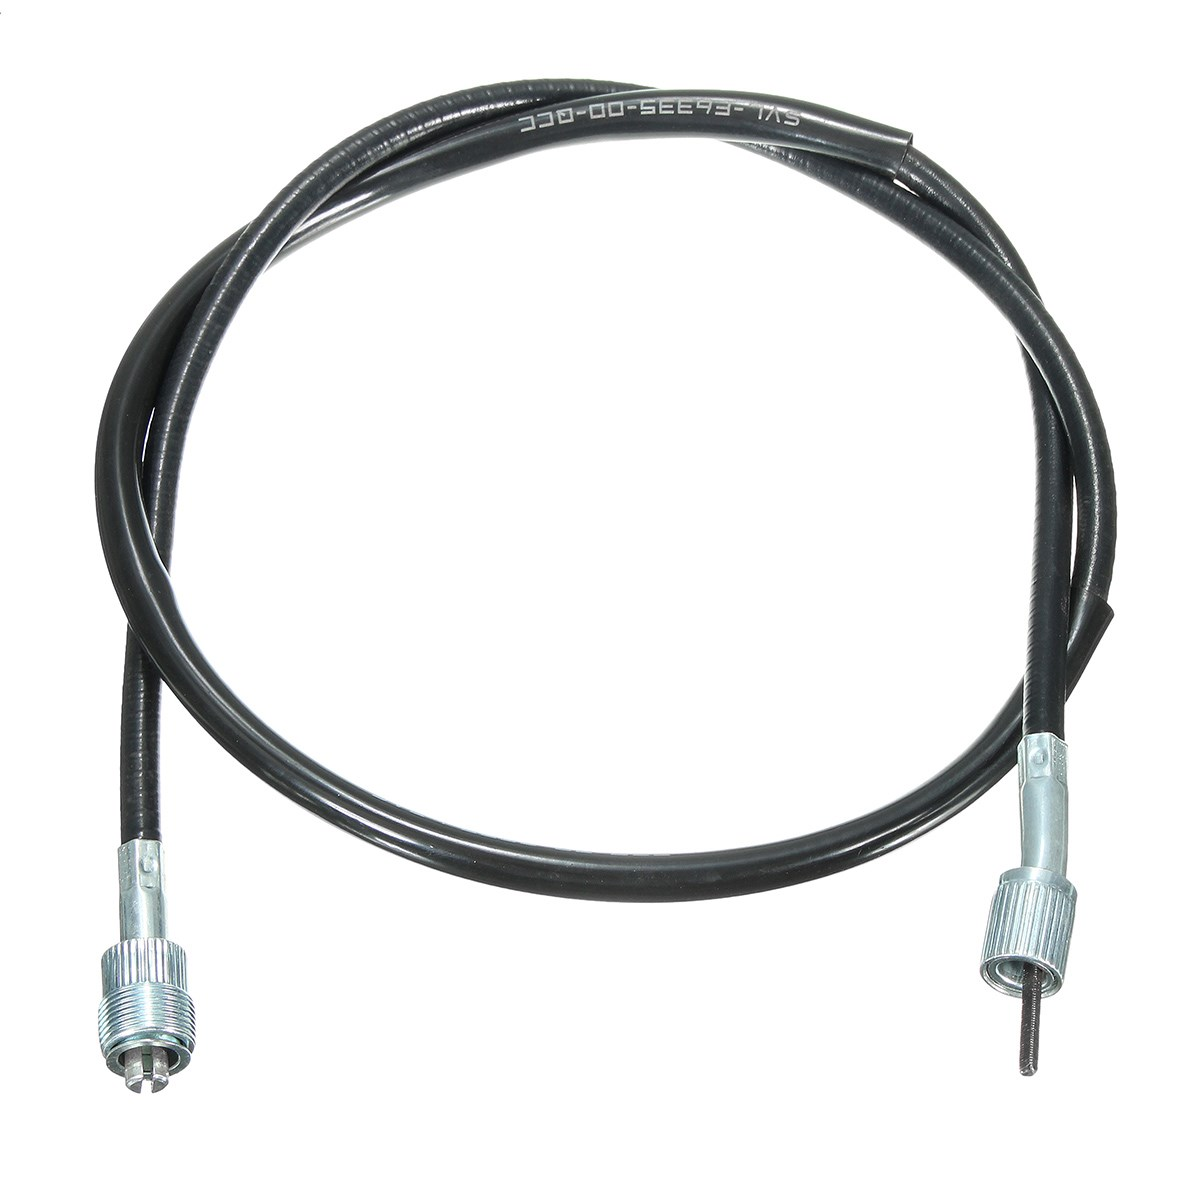 101cm/40 Inch Black For Speedo Cable Flexible Shaft For Suzuki GZ125 /Marauder 1998-2010 co2 16 40 101